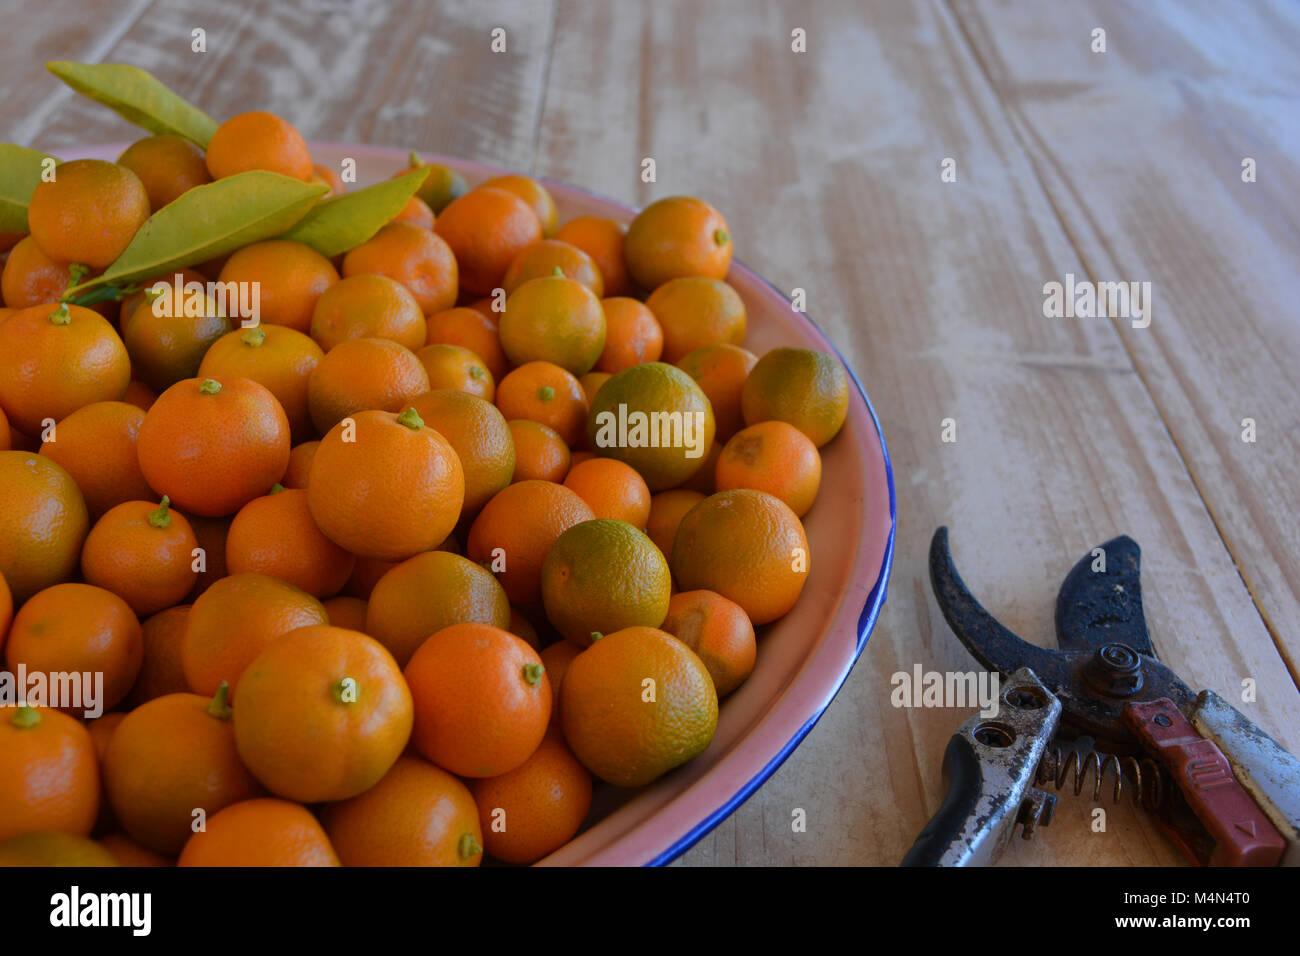 C Microcarpa Stock Photos Images Alamy Limau Kasturi Original New Also Known As Kalamansi Or Calamondin Scientific Name Citrus